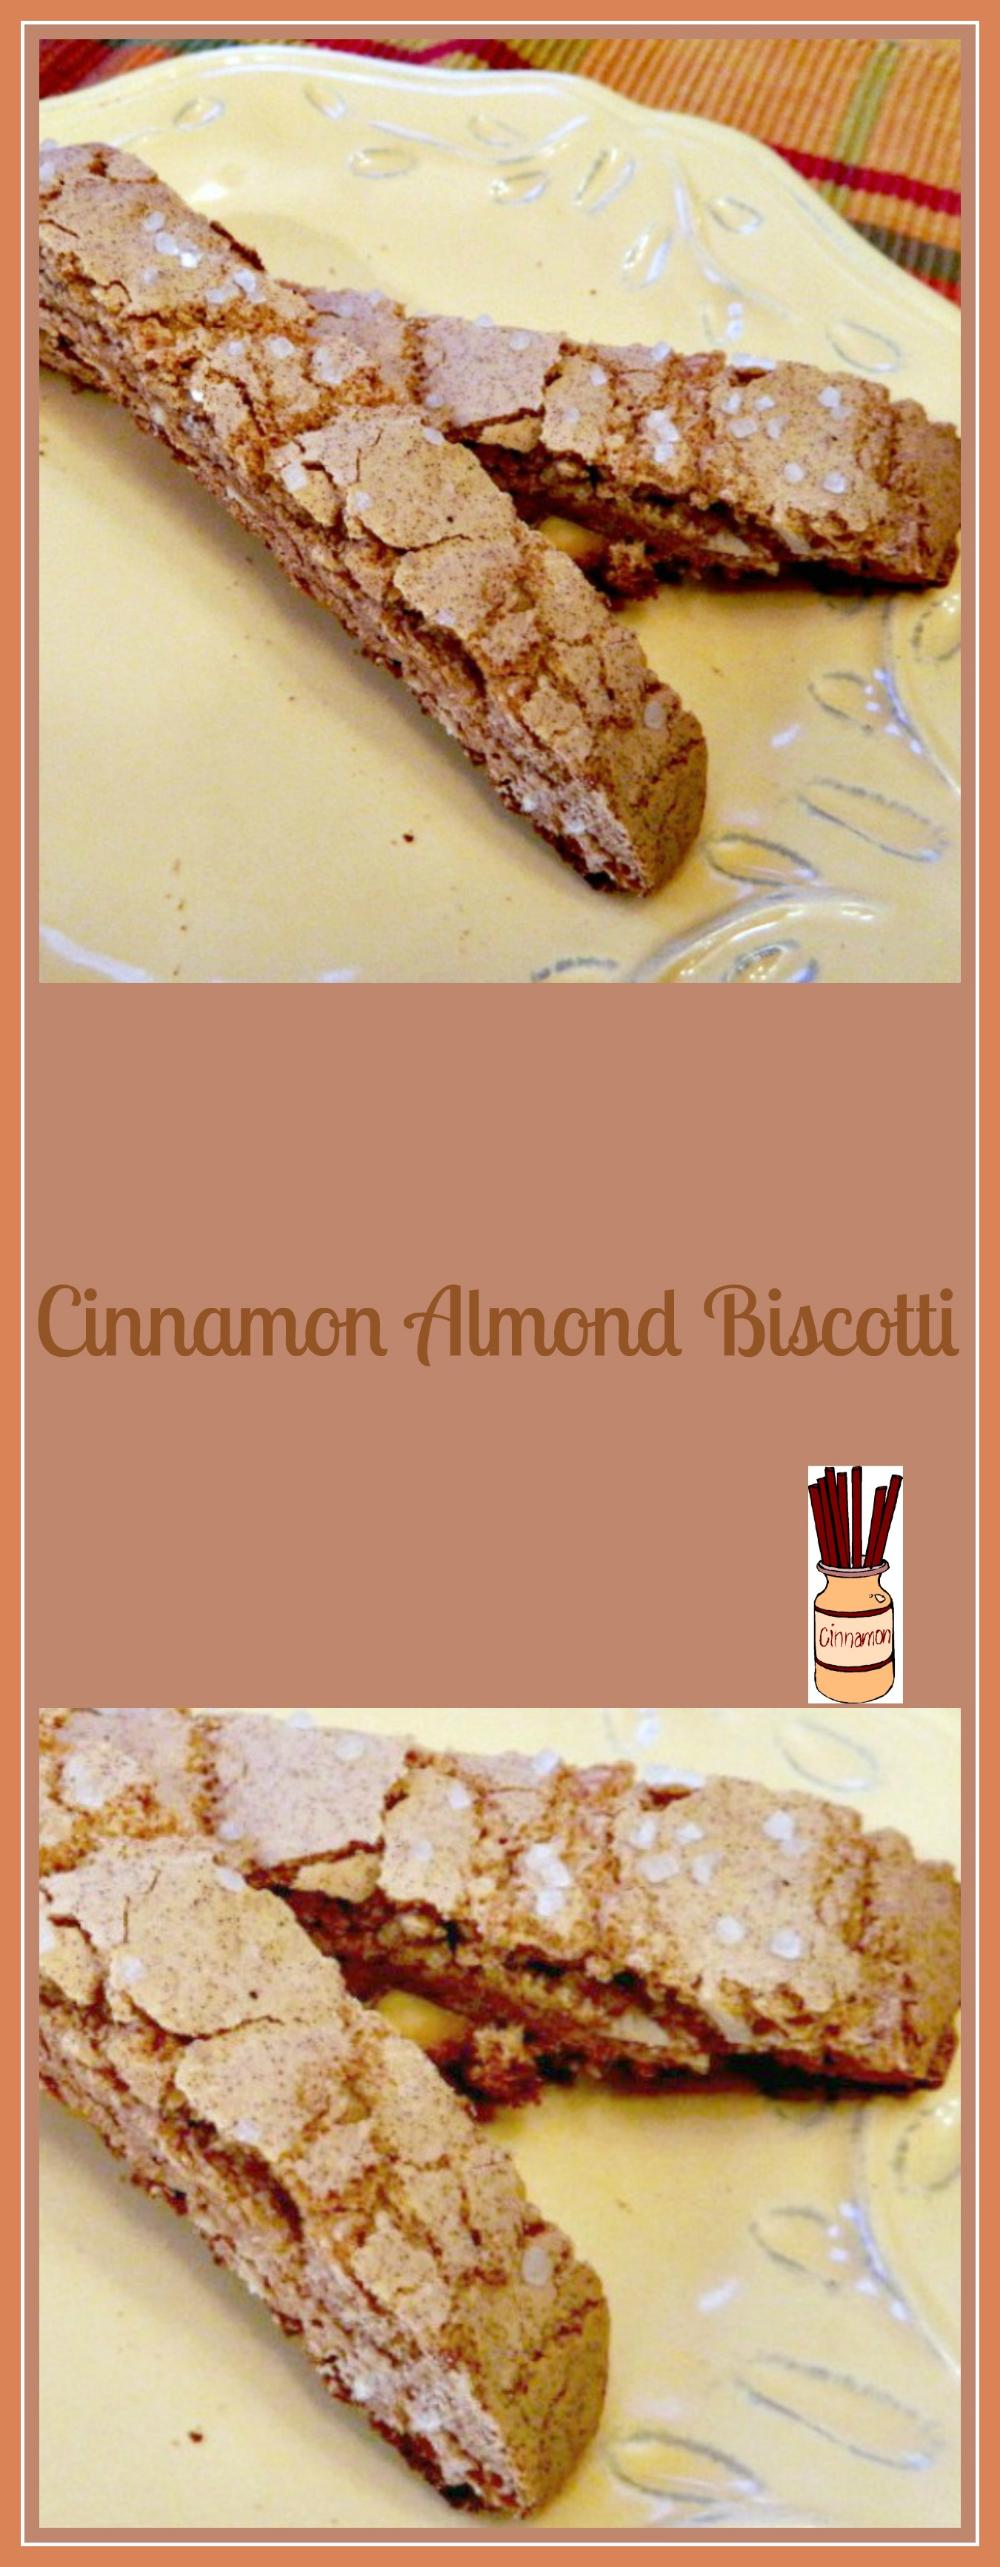 Giant Cinnamon Almond Biscotti - Pams Daily Dish